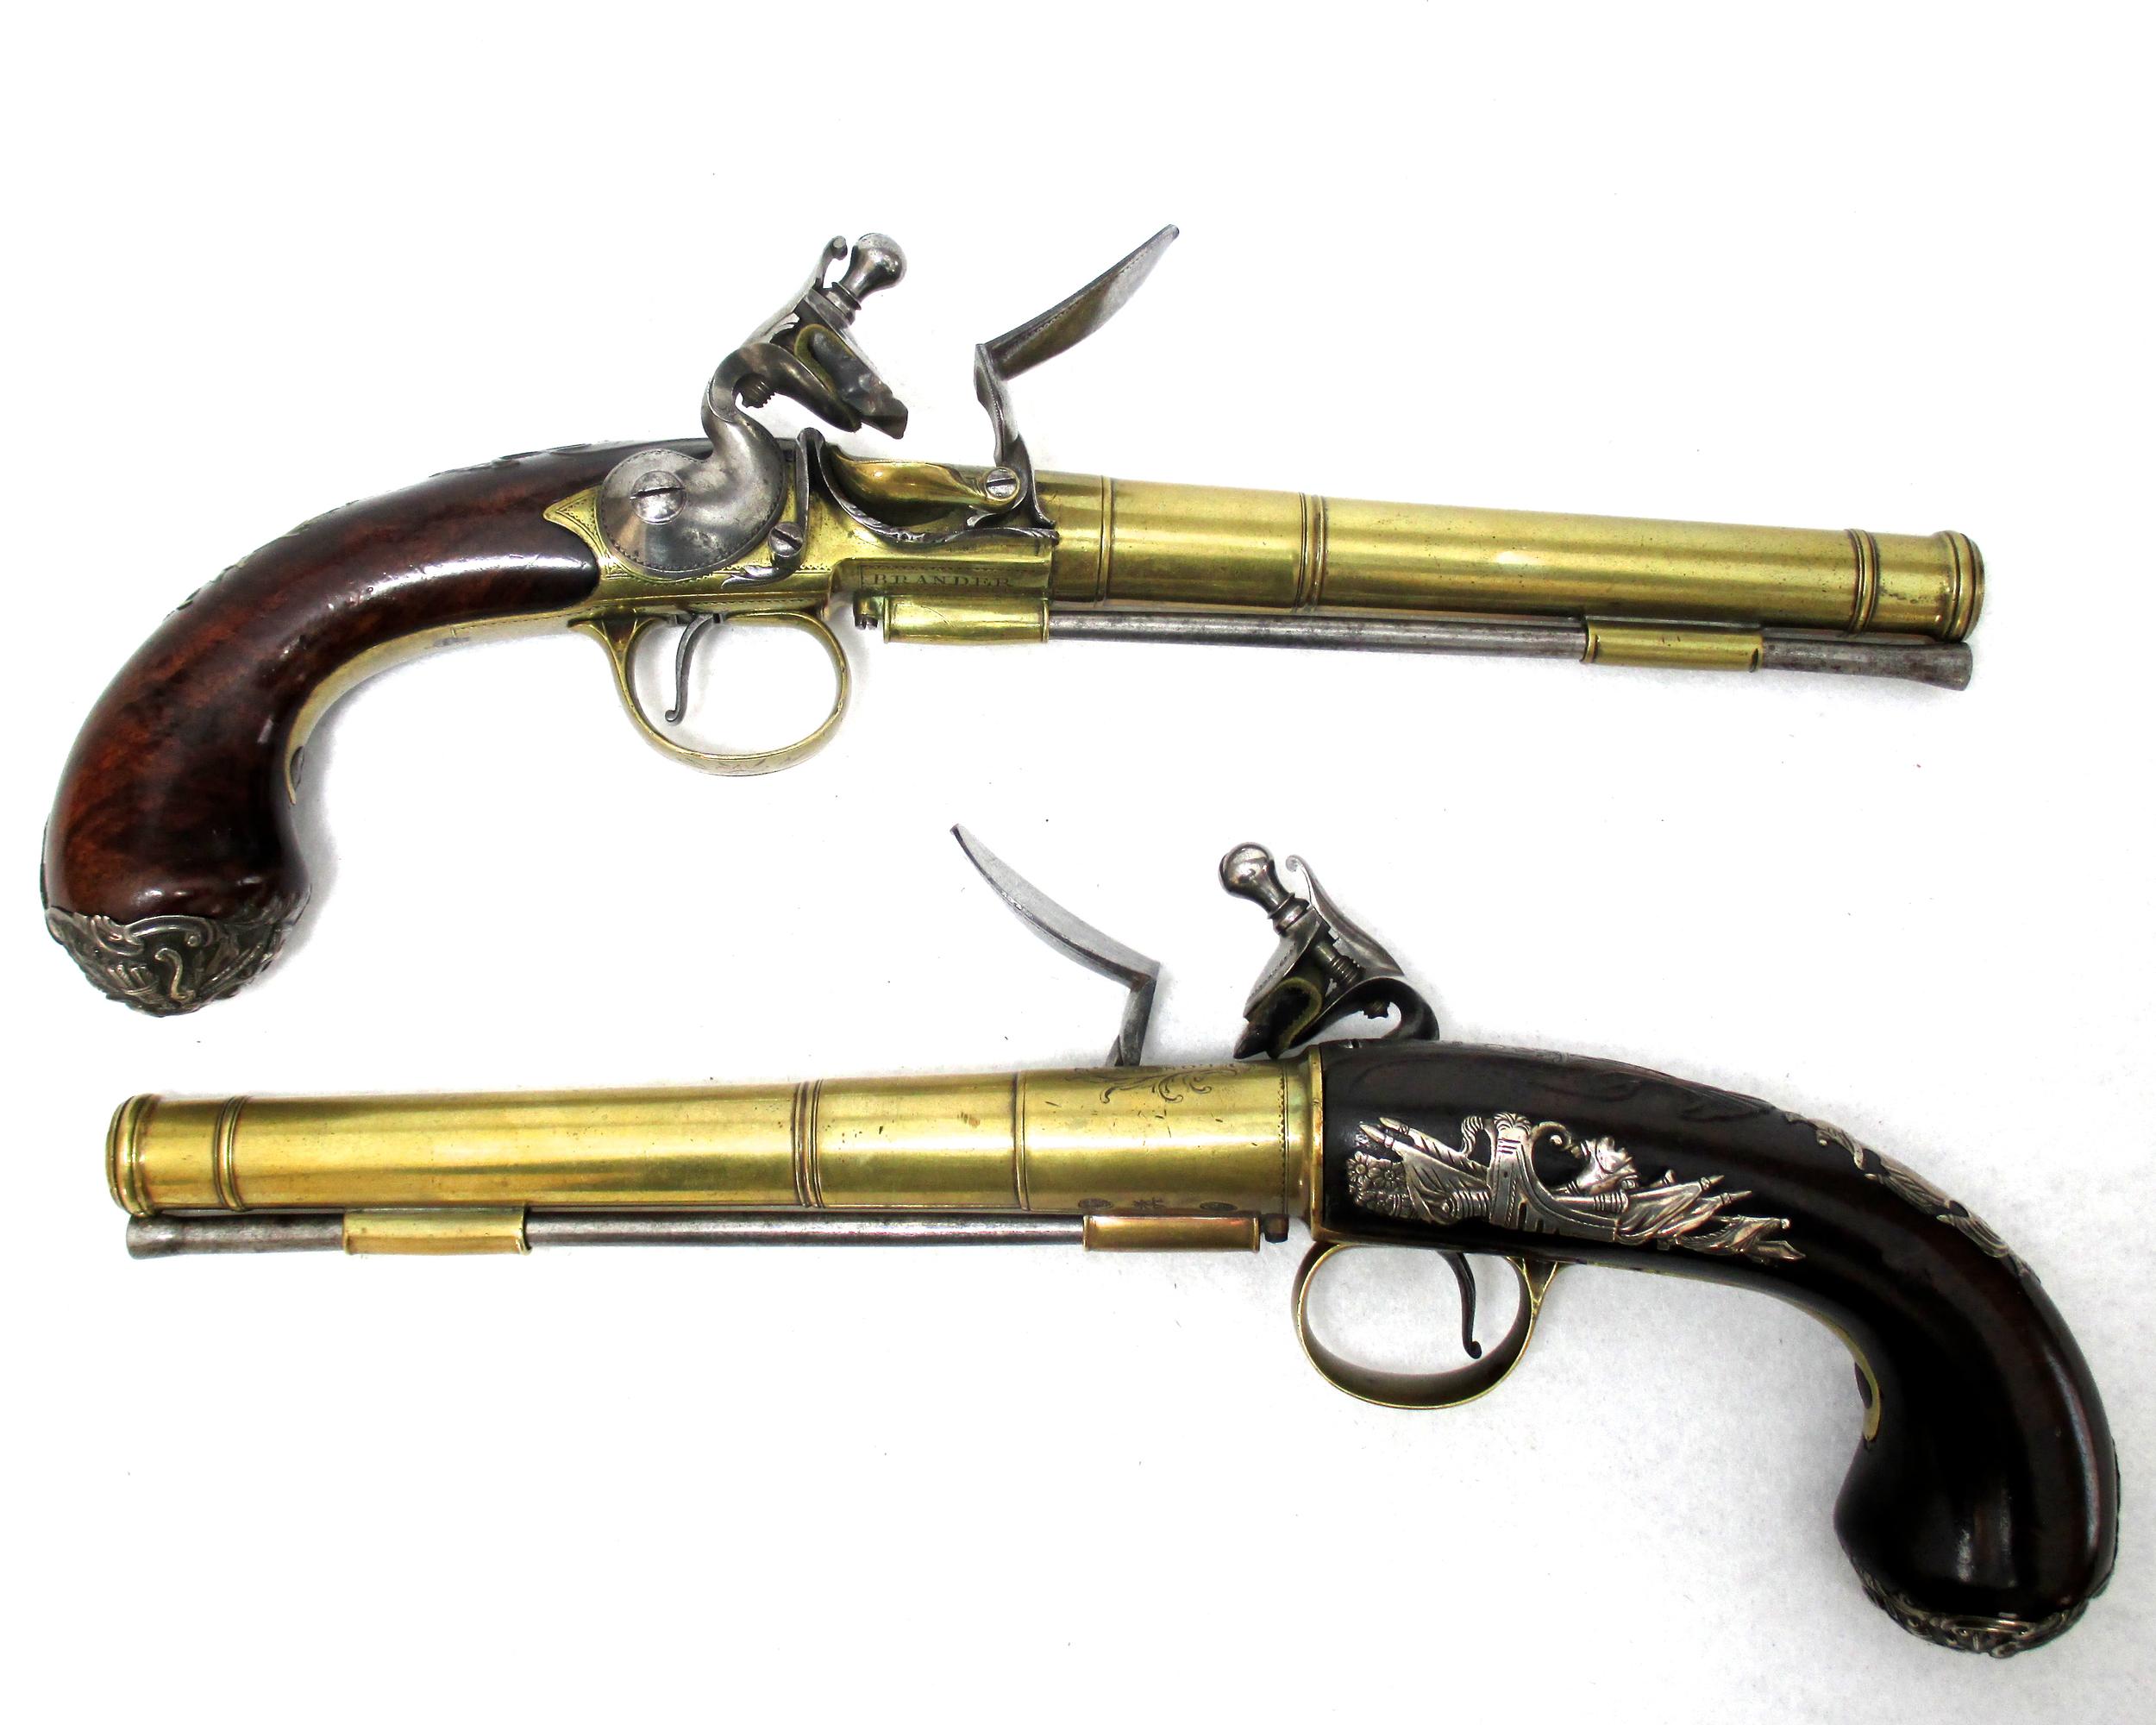 pair-flintlock-pistols-william-brander-english-guns-weapons-gary-friedland-arms-armor1.jpg